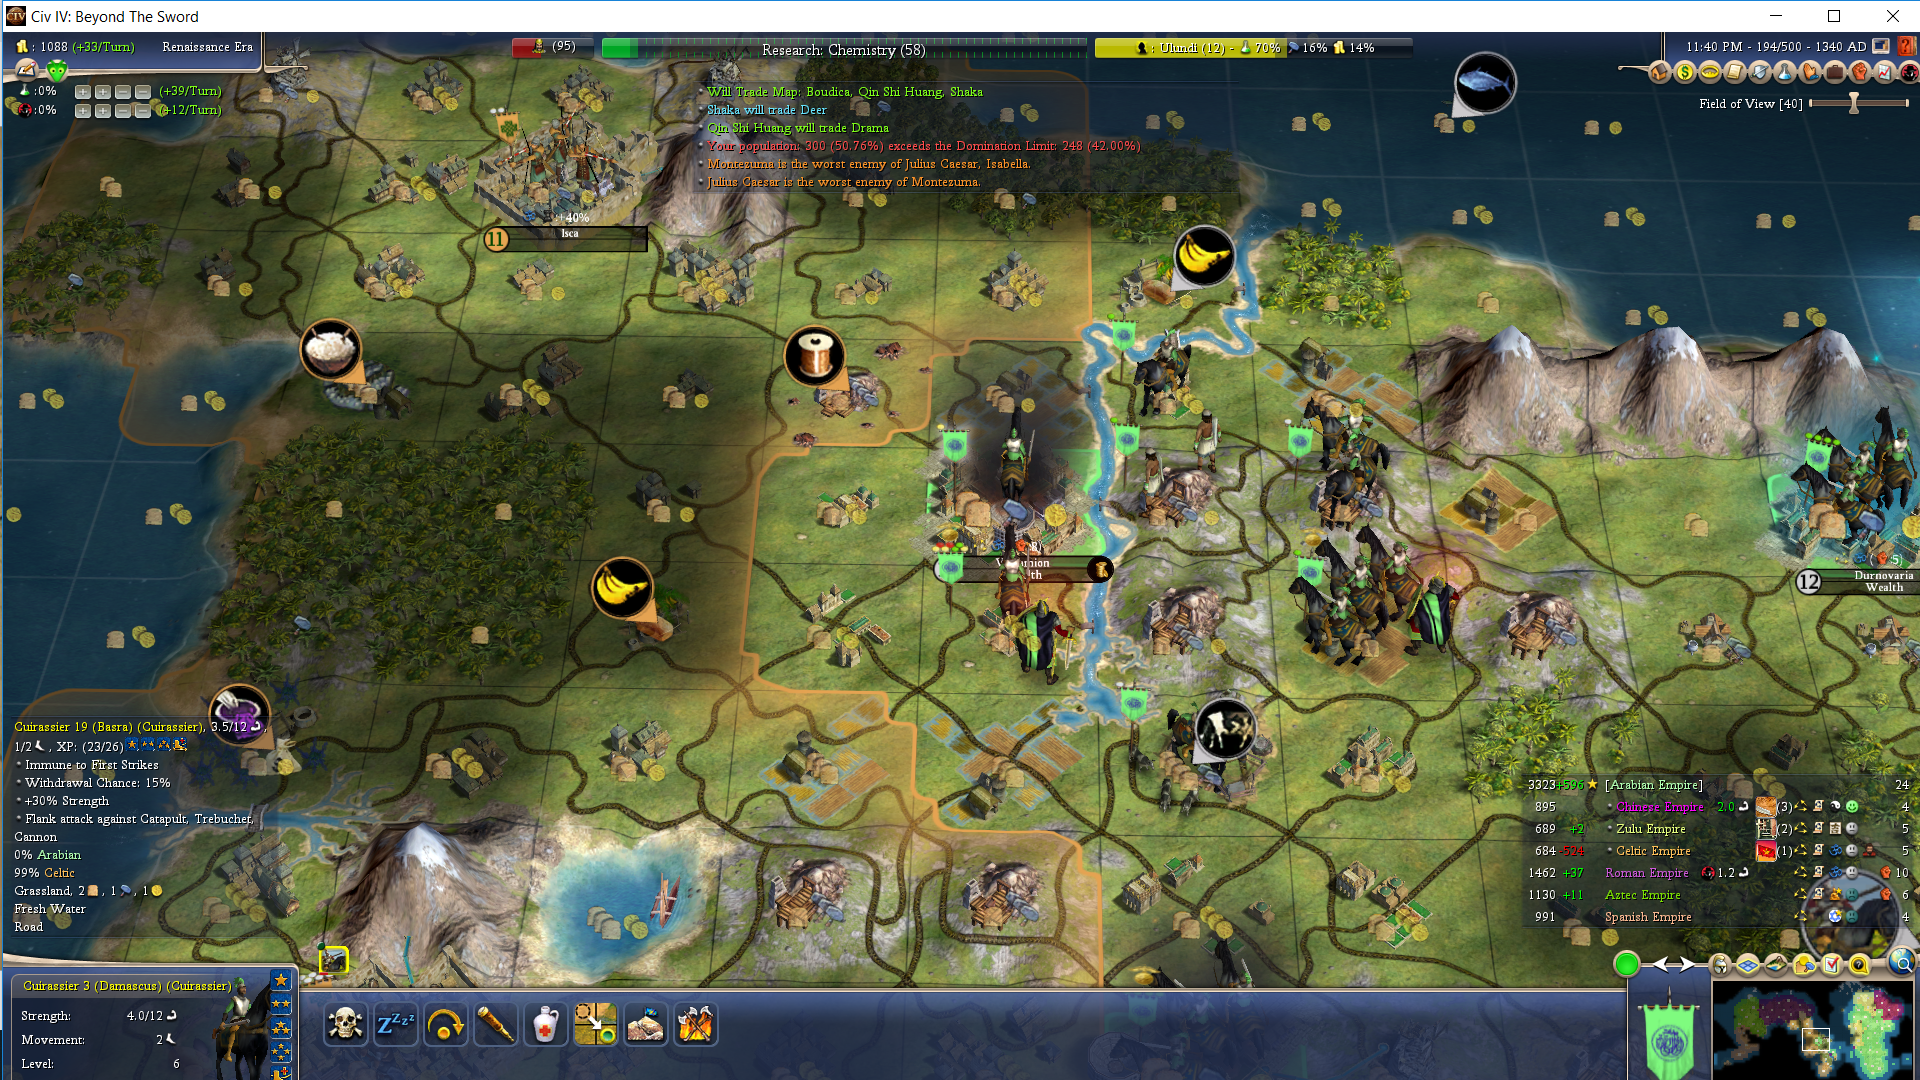 Screenshot (11209).png